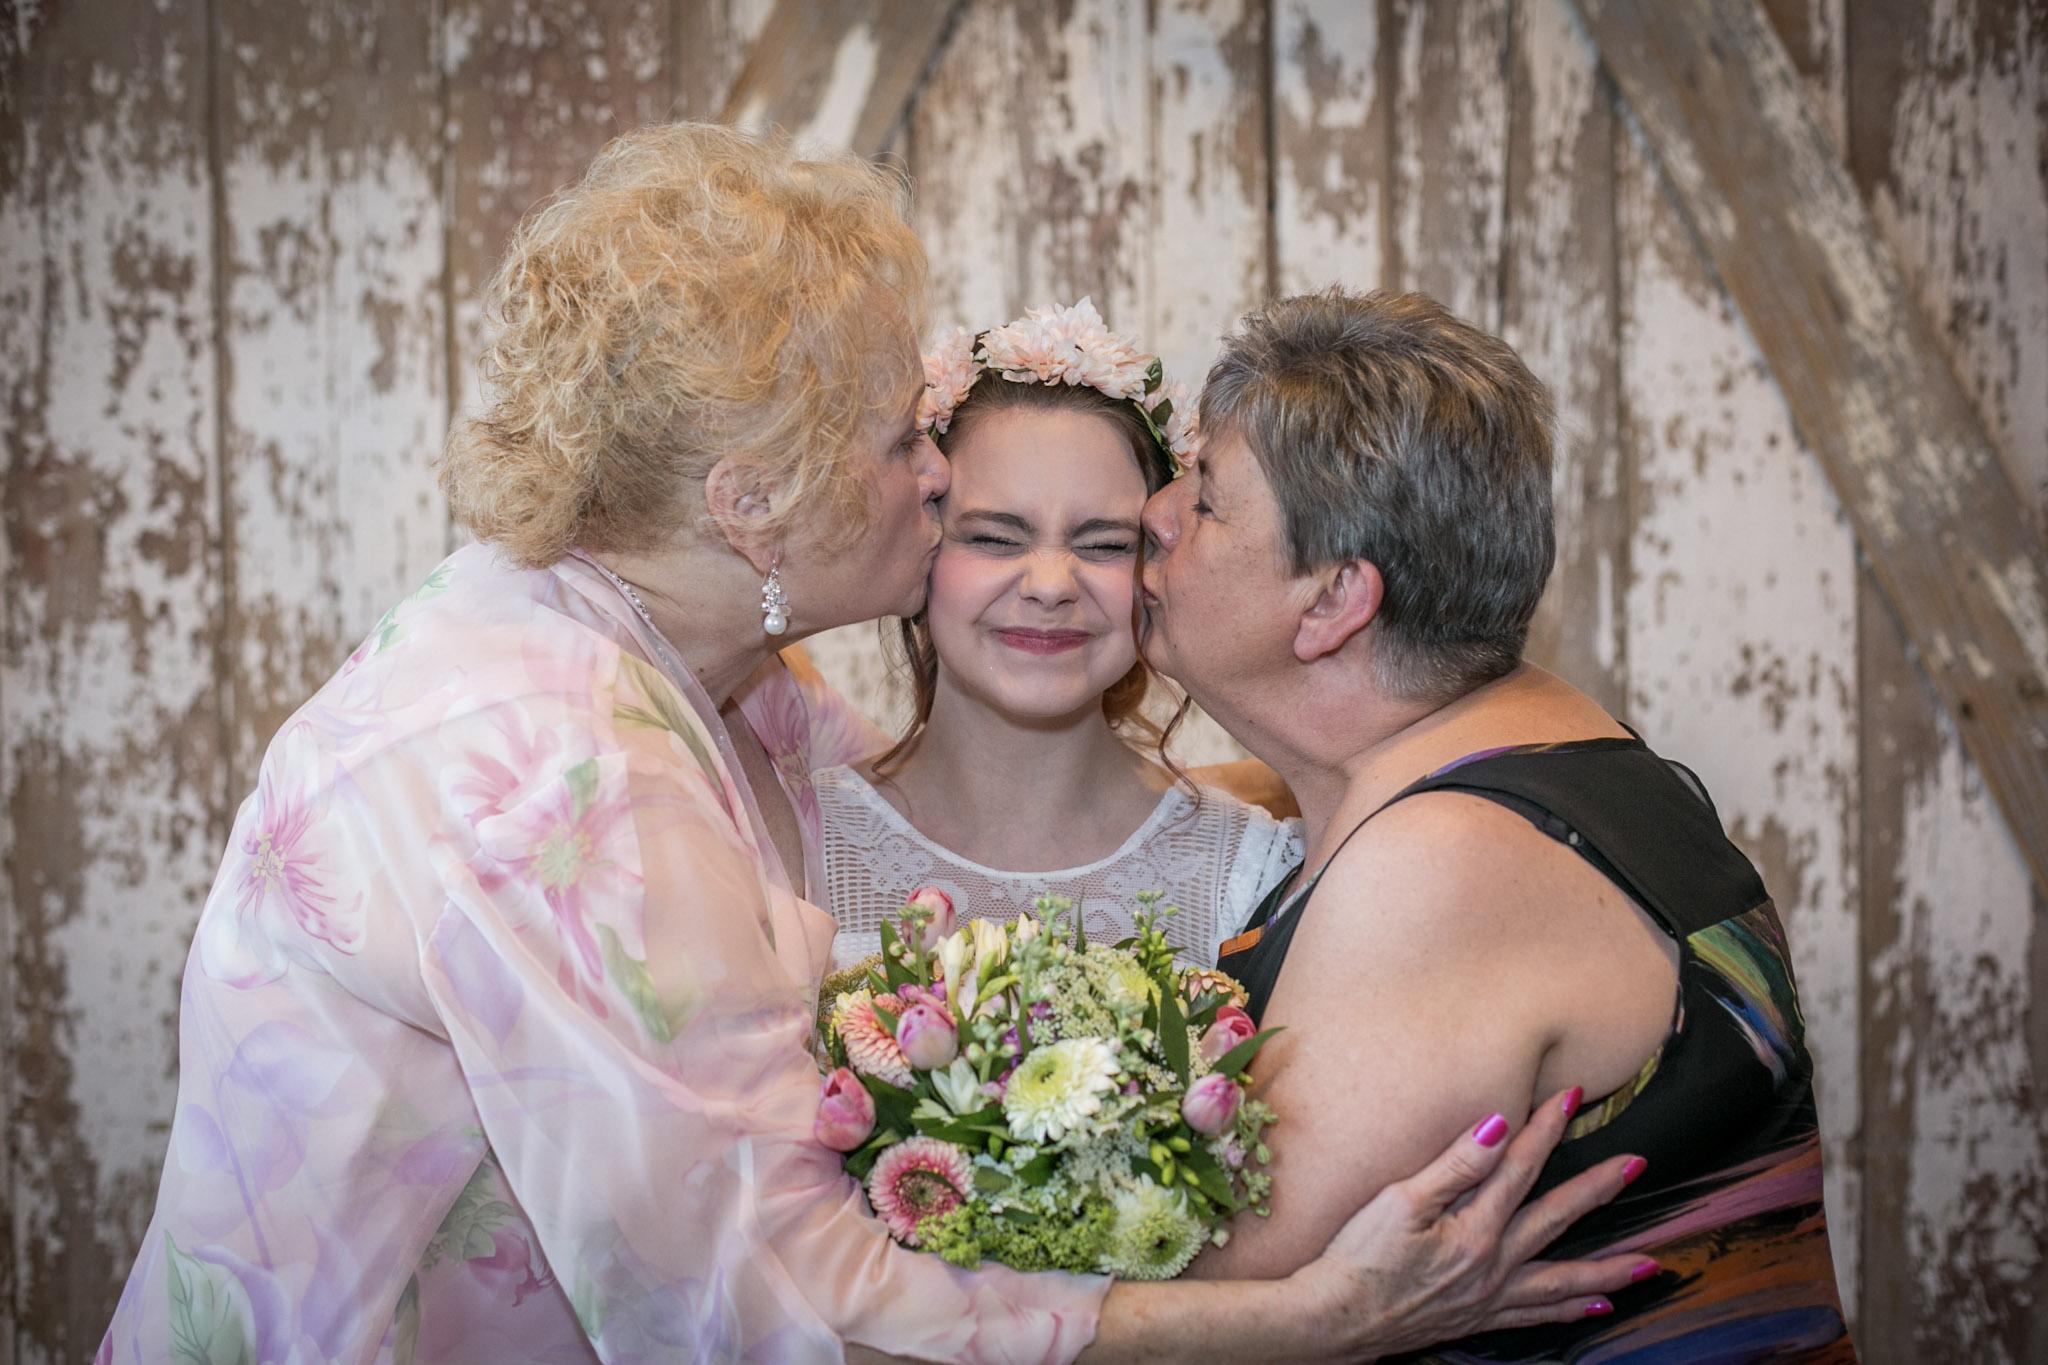 Kansas+City-Small+Wedding-Elope_Intimate_Ceremony_Mother's+Day_10.jpg